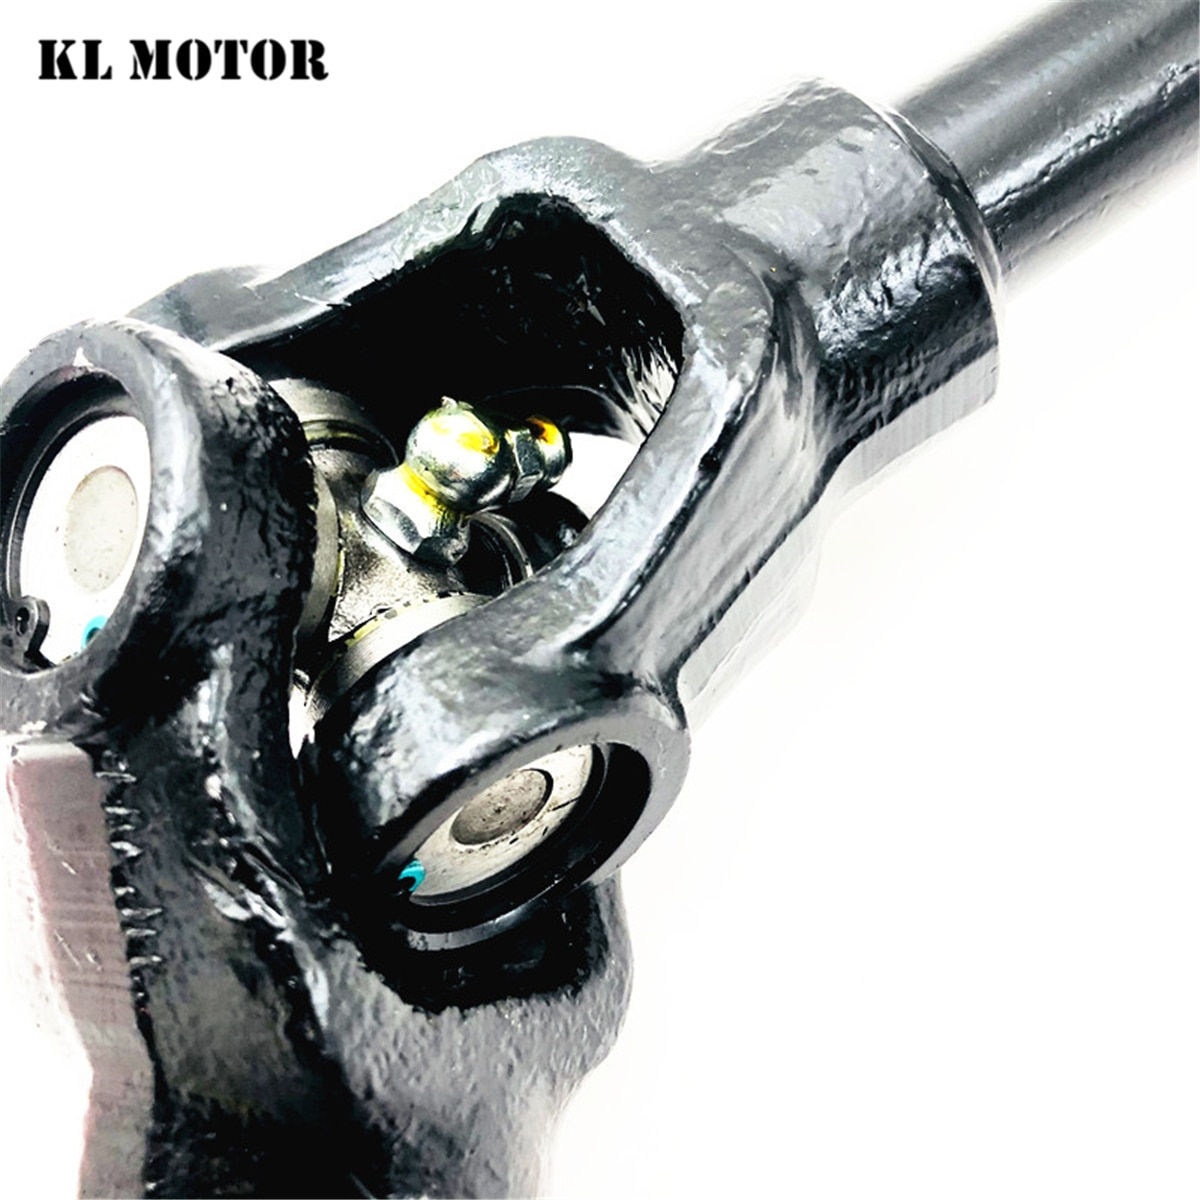 LH250 LH260 LH300 Motorcycle Front Universal Joint For LINHAI 250 260 300 ATV 400ATV QUAD O KART 24437 enlarge